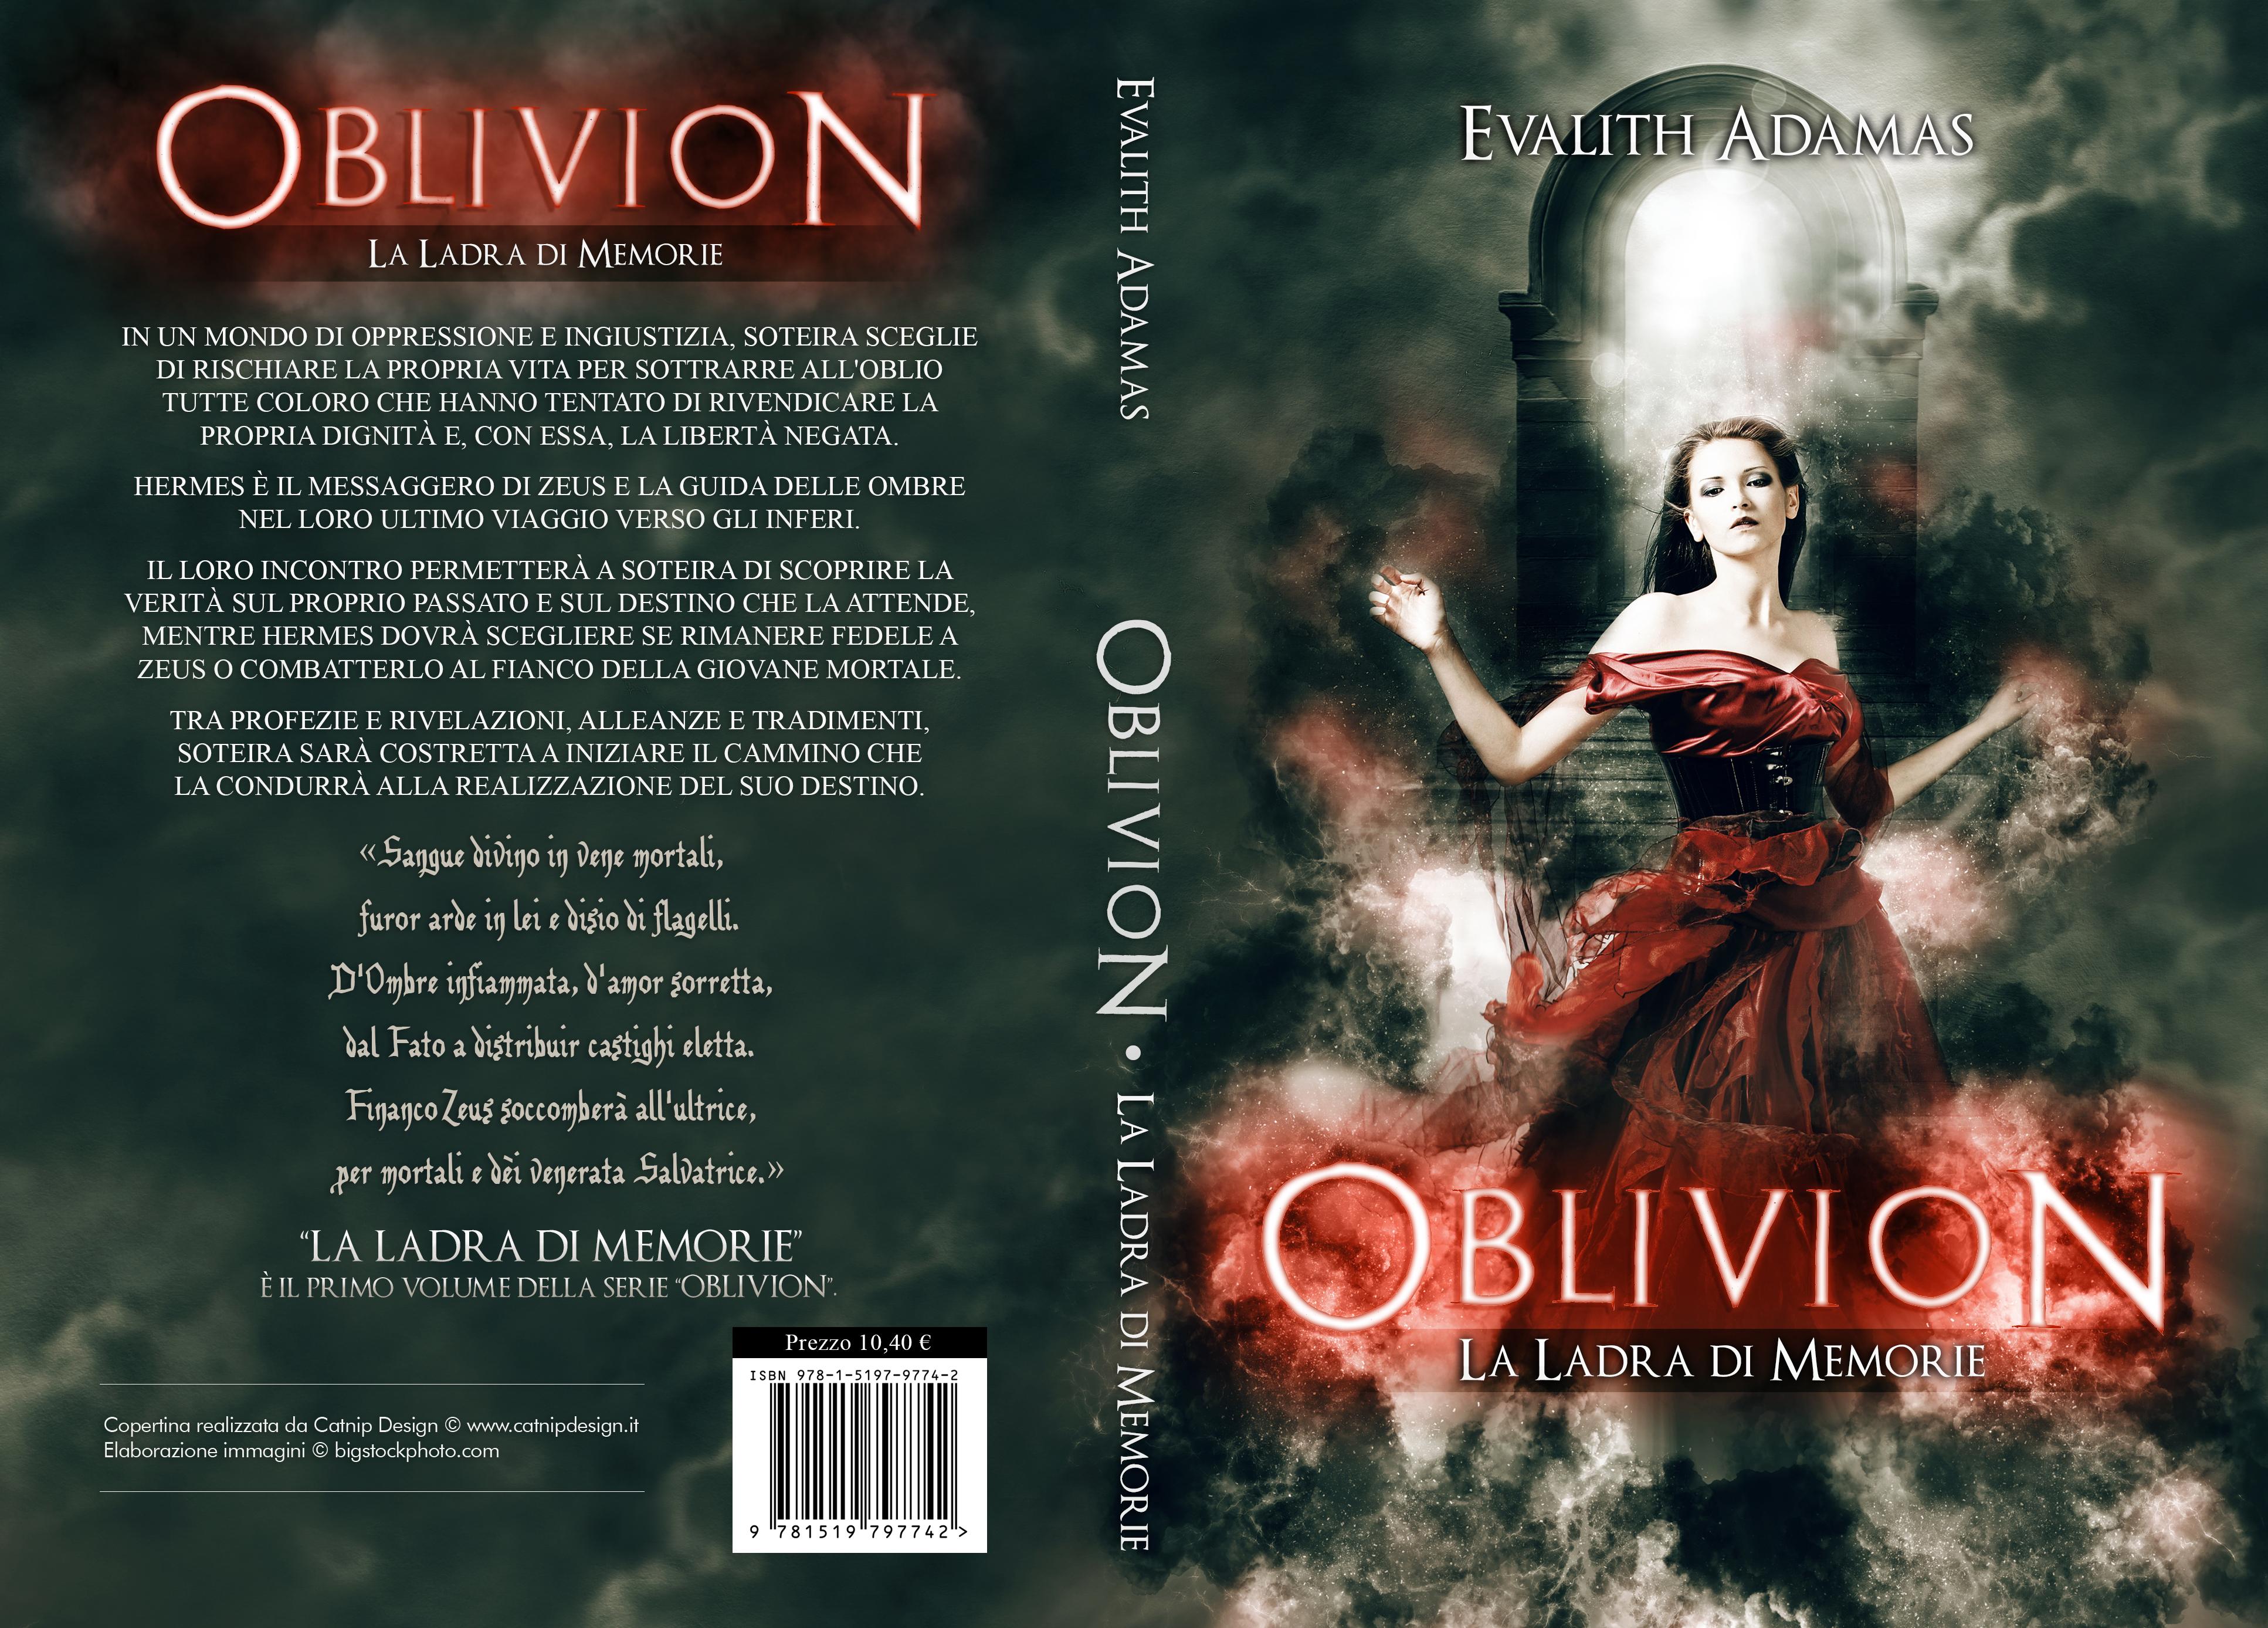 Oblivion - La ladra di memorie, Evalith Adamas